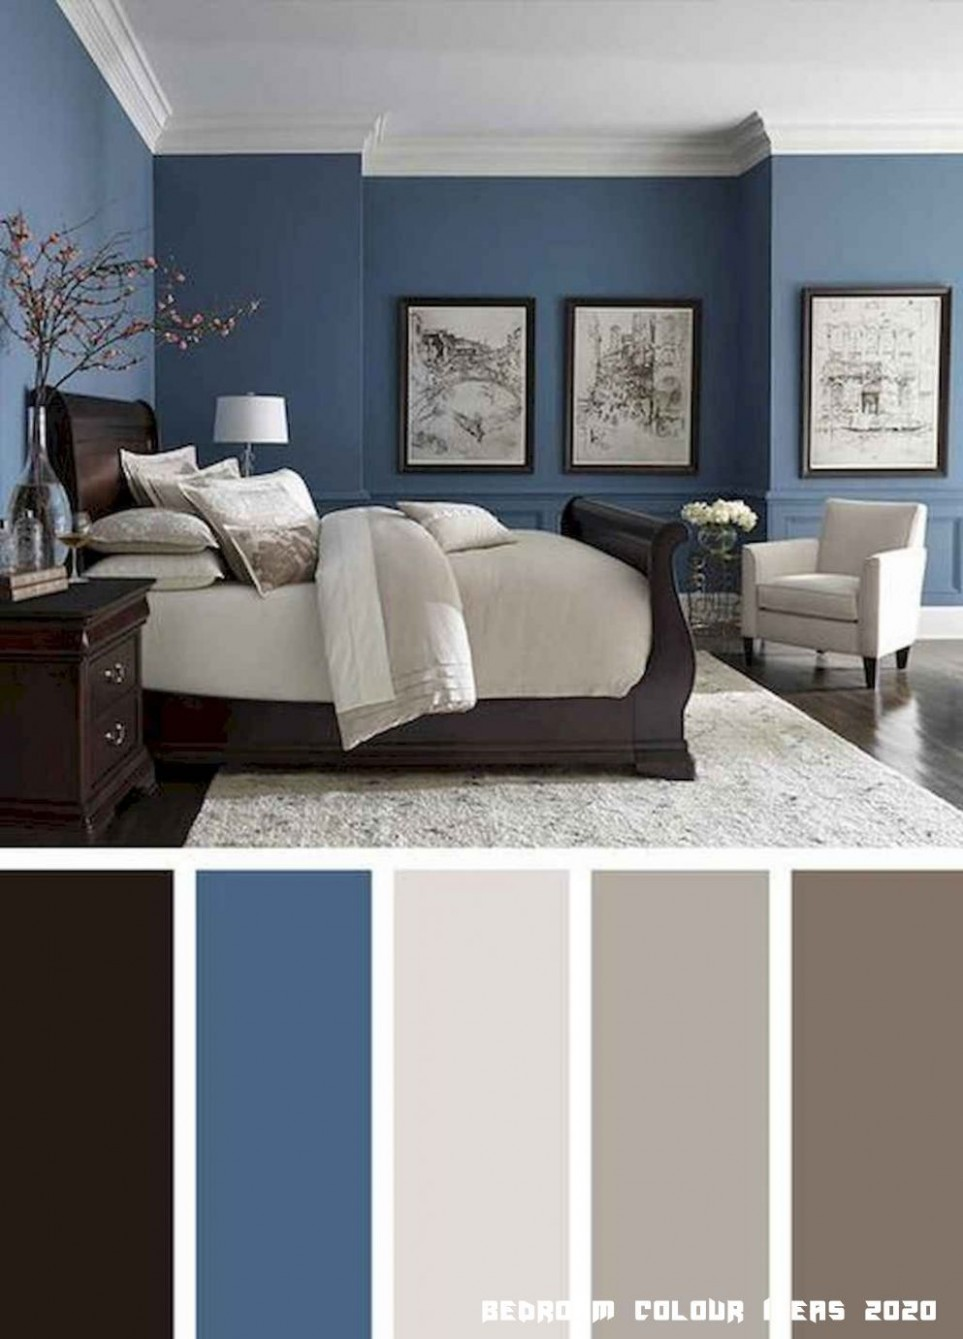 9 Bedroom Colour Ideas 9 in 9  Beautiful bedroom colors  - Bedroom Colour Ideas